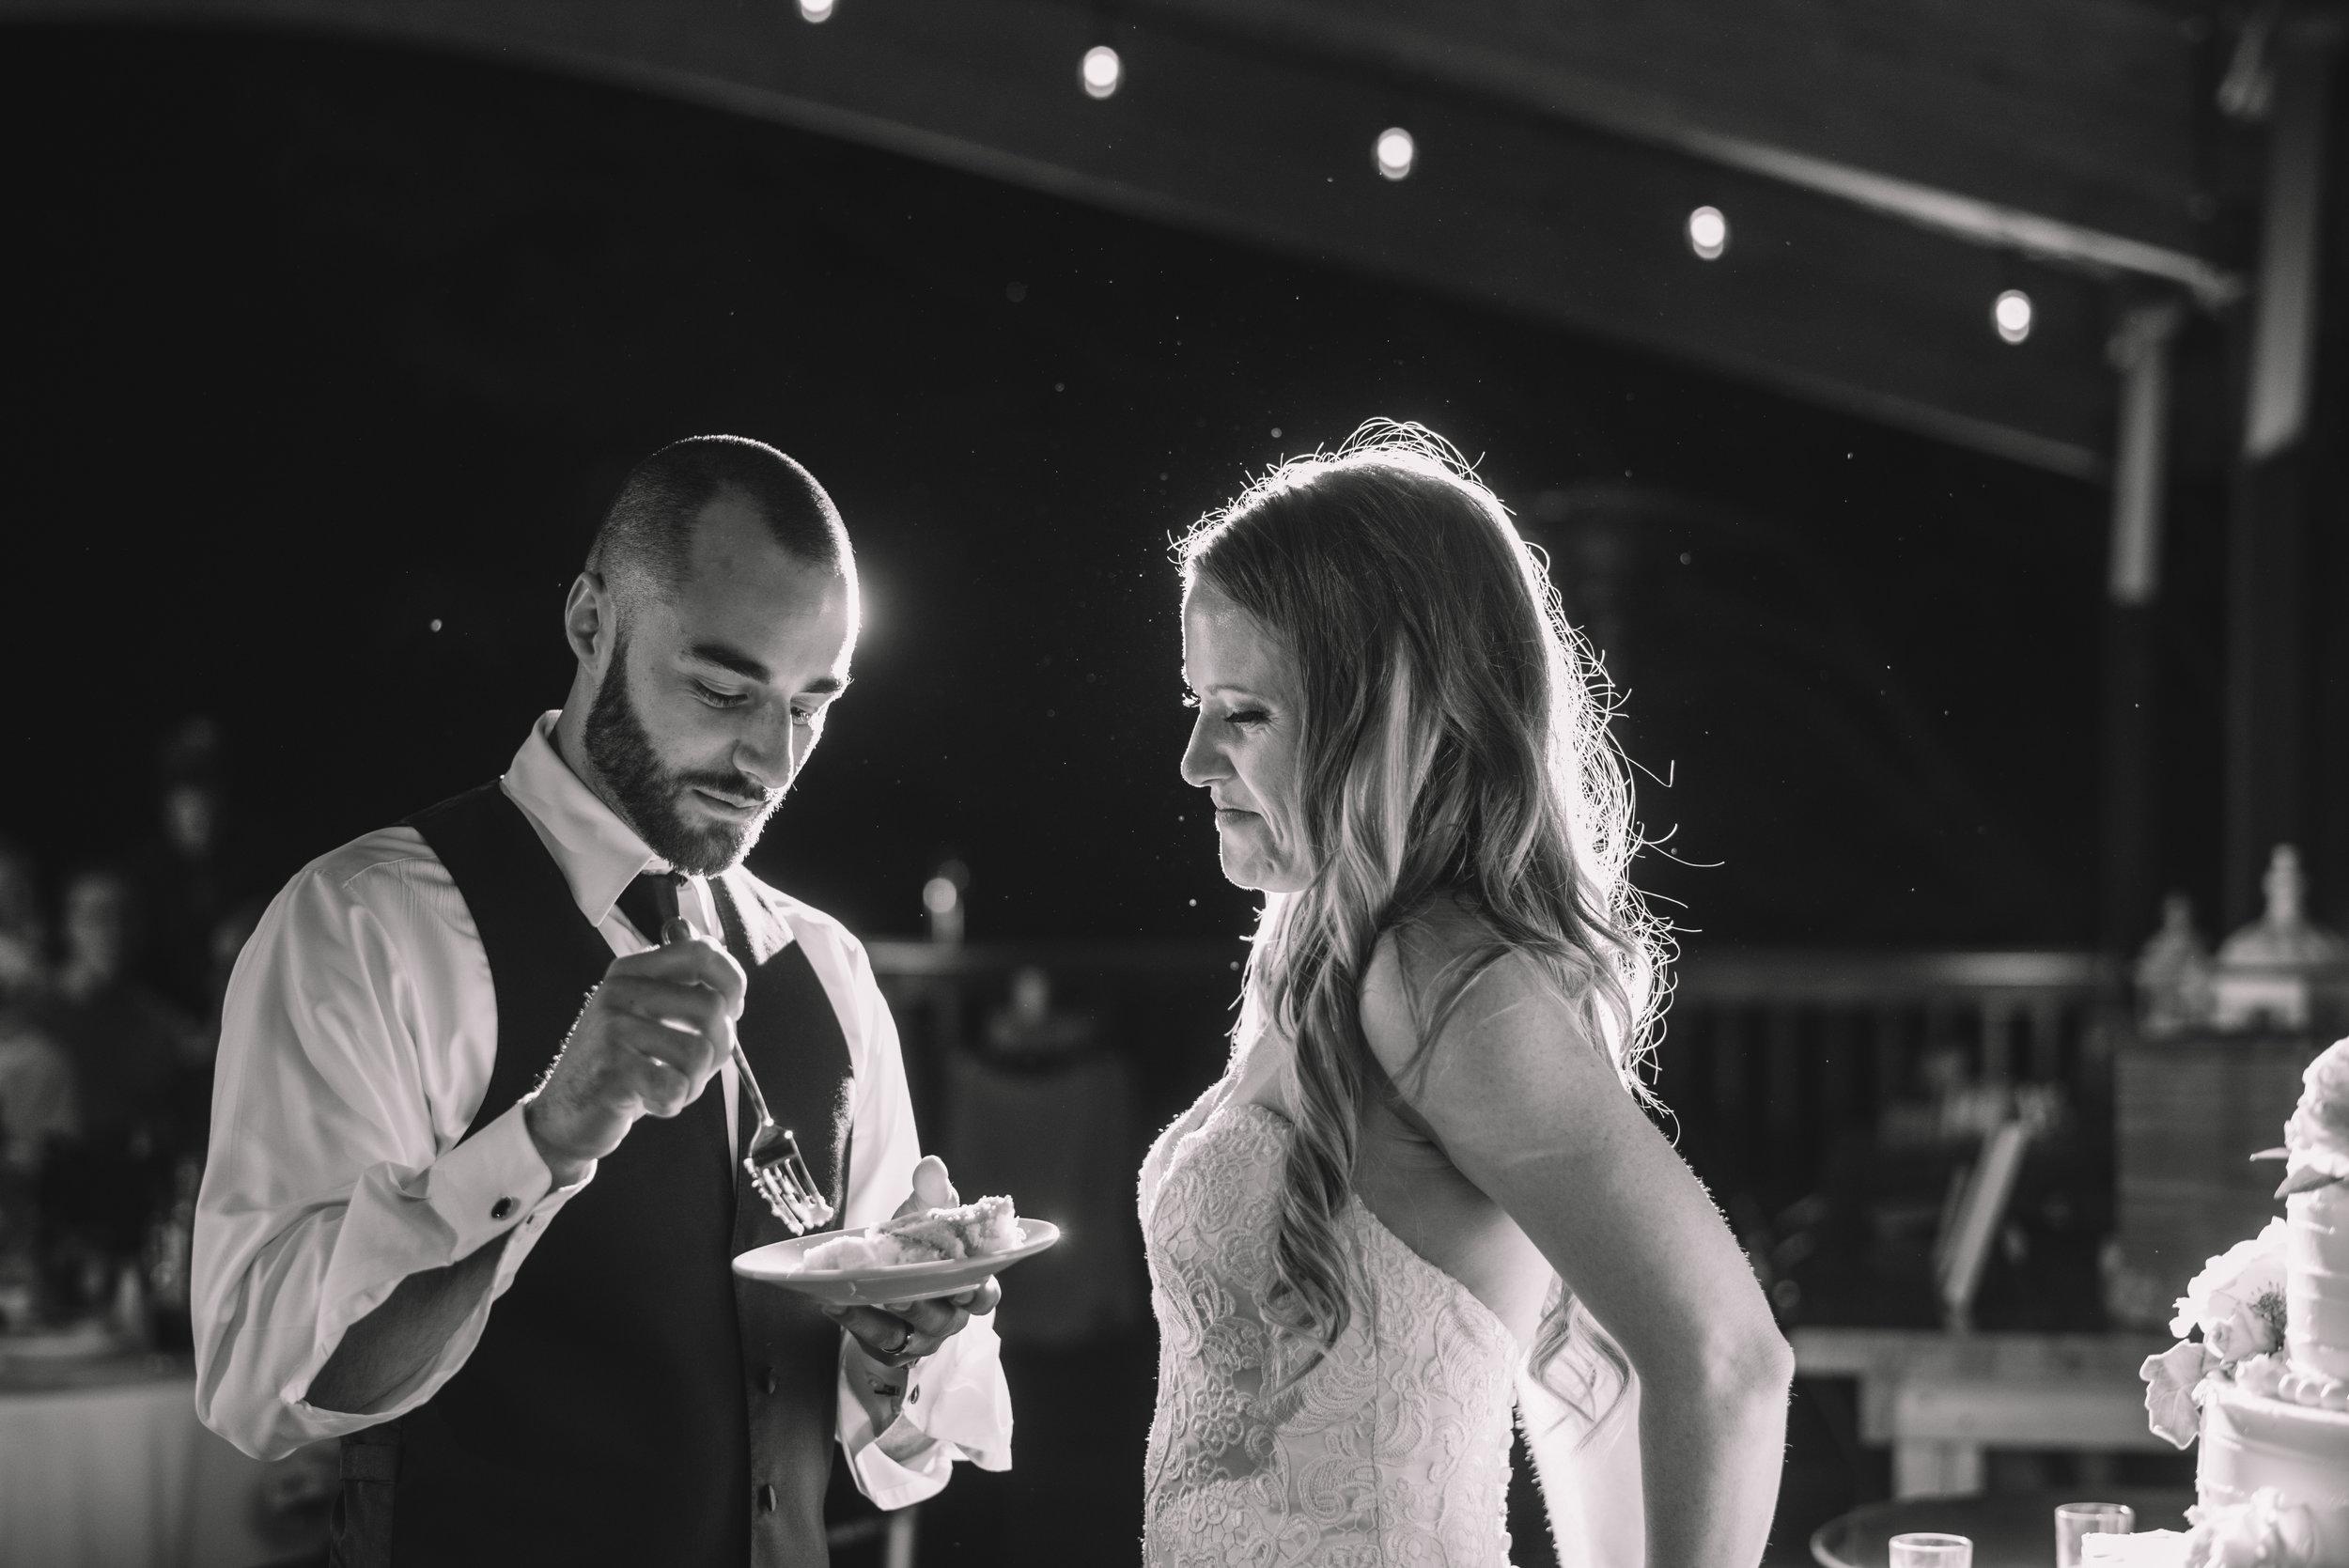 WeddingPhotos | NJPhotographer | Highlights-7-5.jpg